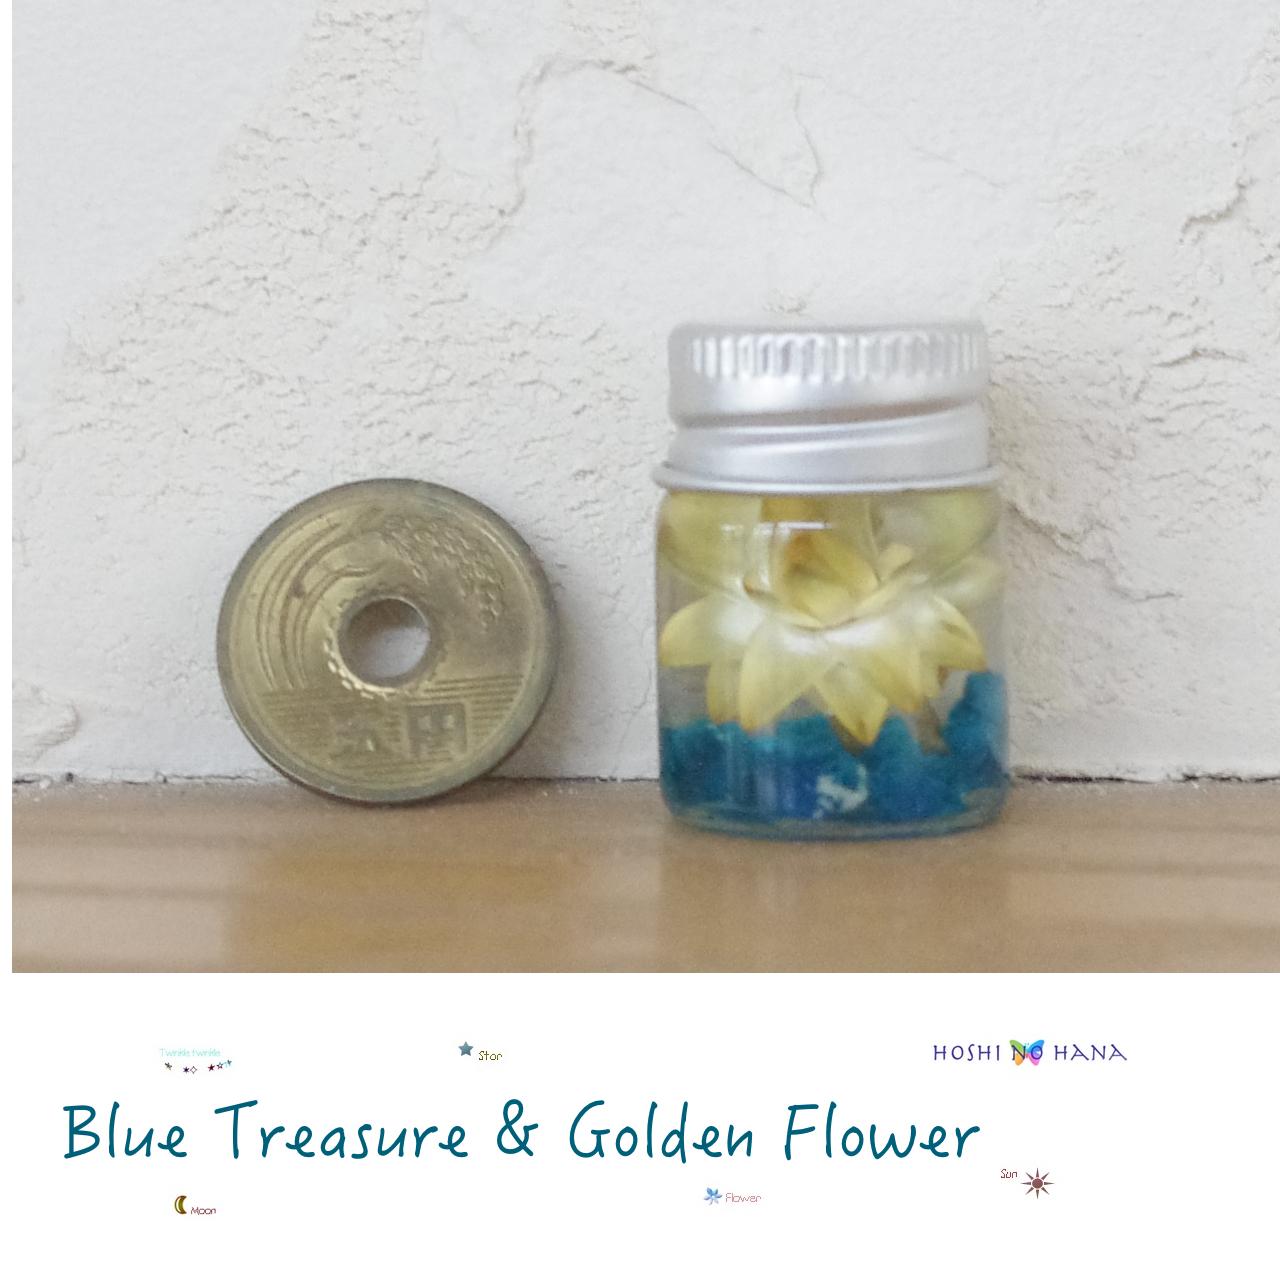 【Petit Vol.1】パワーストーンハーバリウム *青い至宝カバンサイトと黄金の花ヘリクリサム*